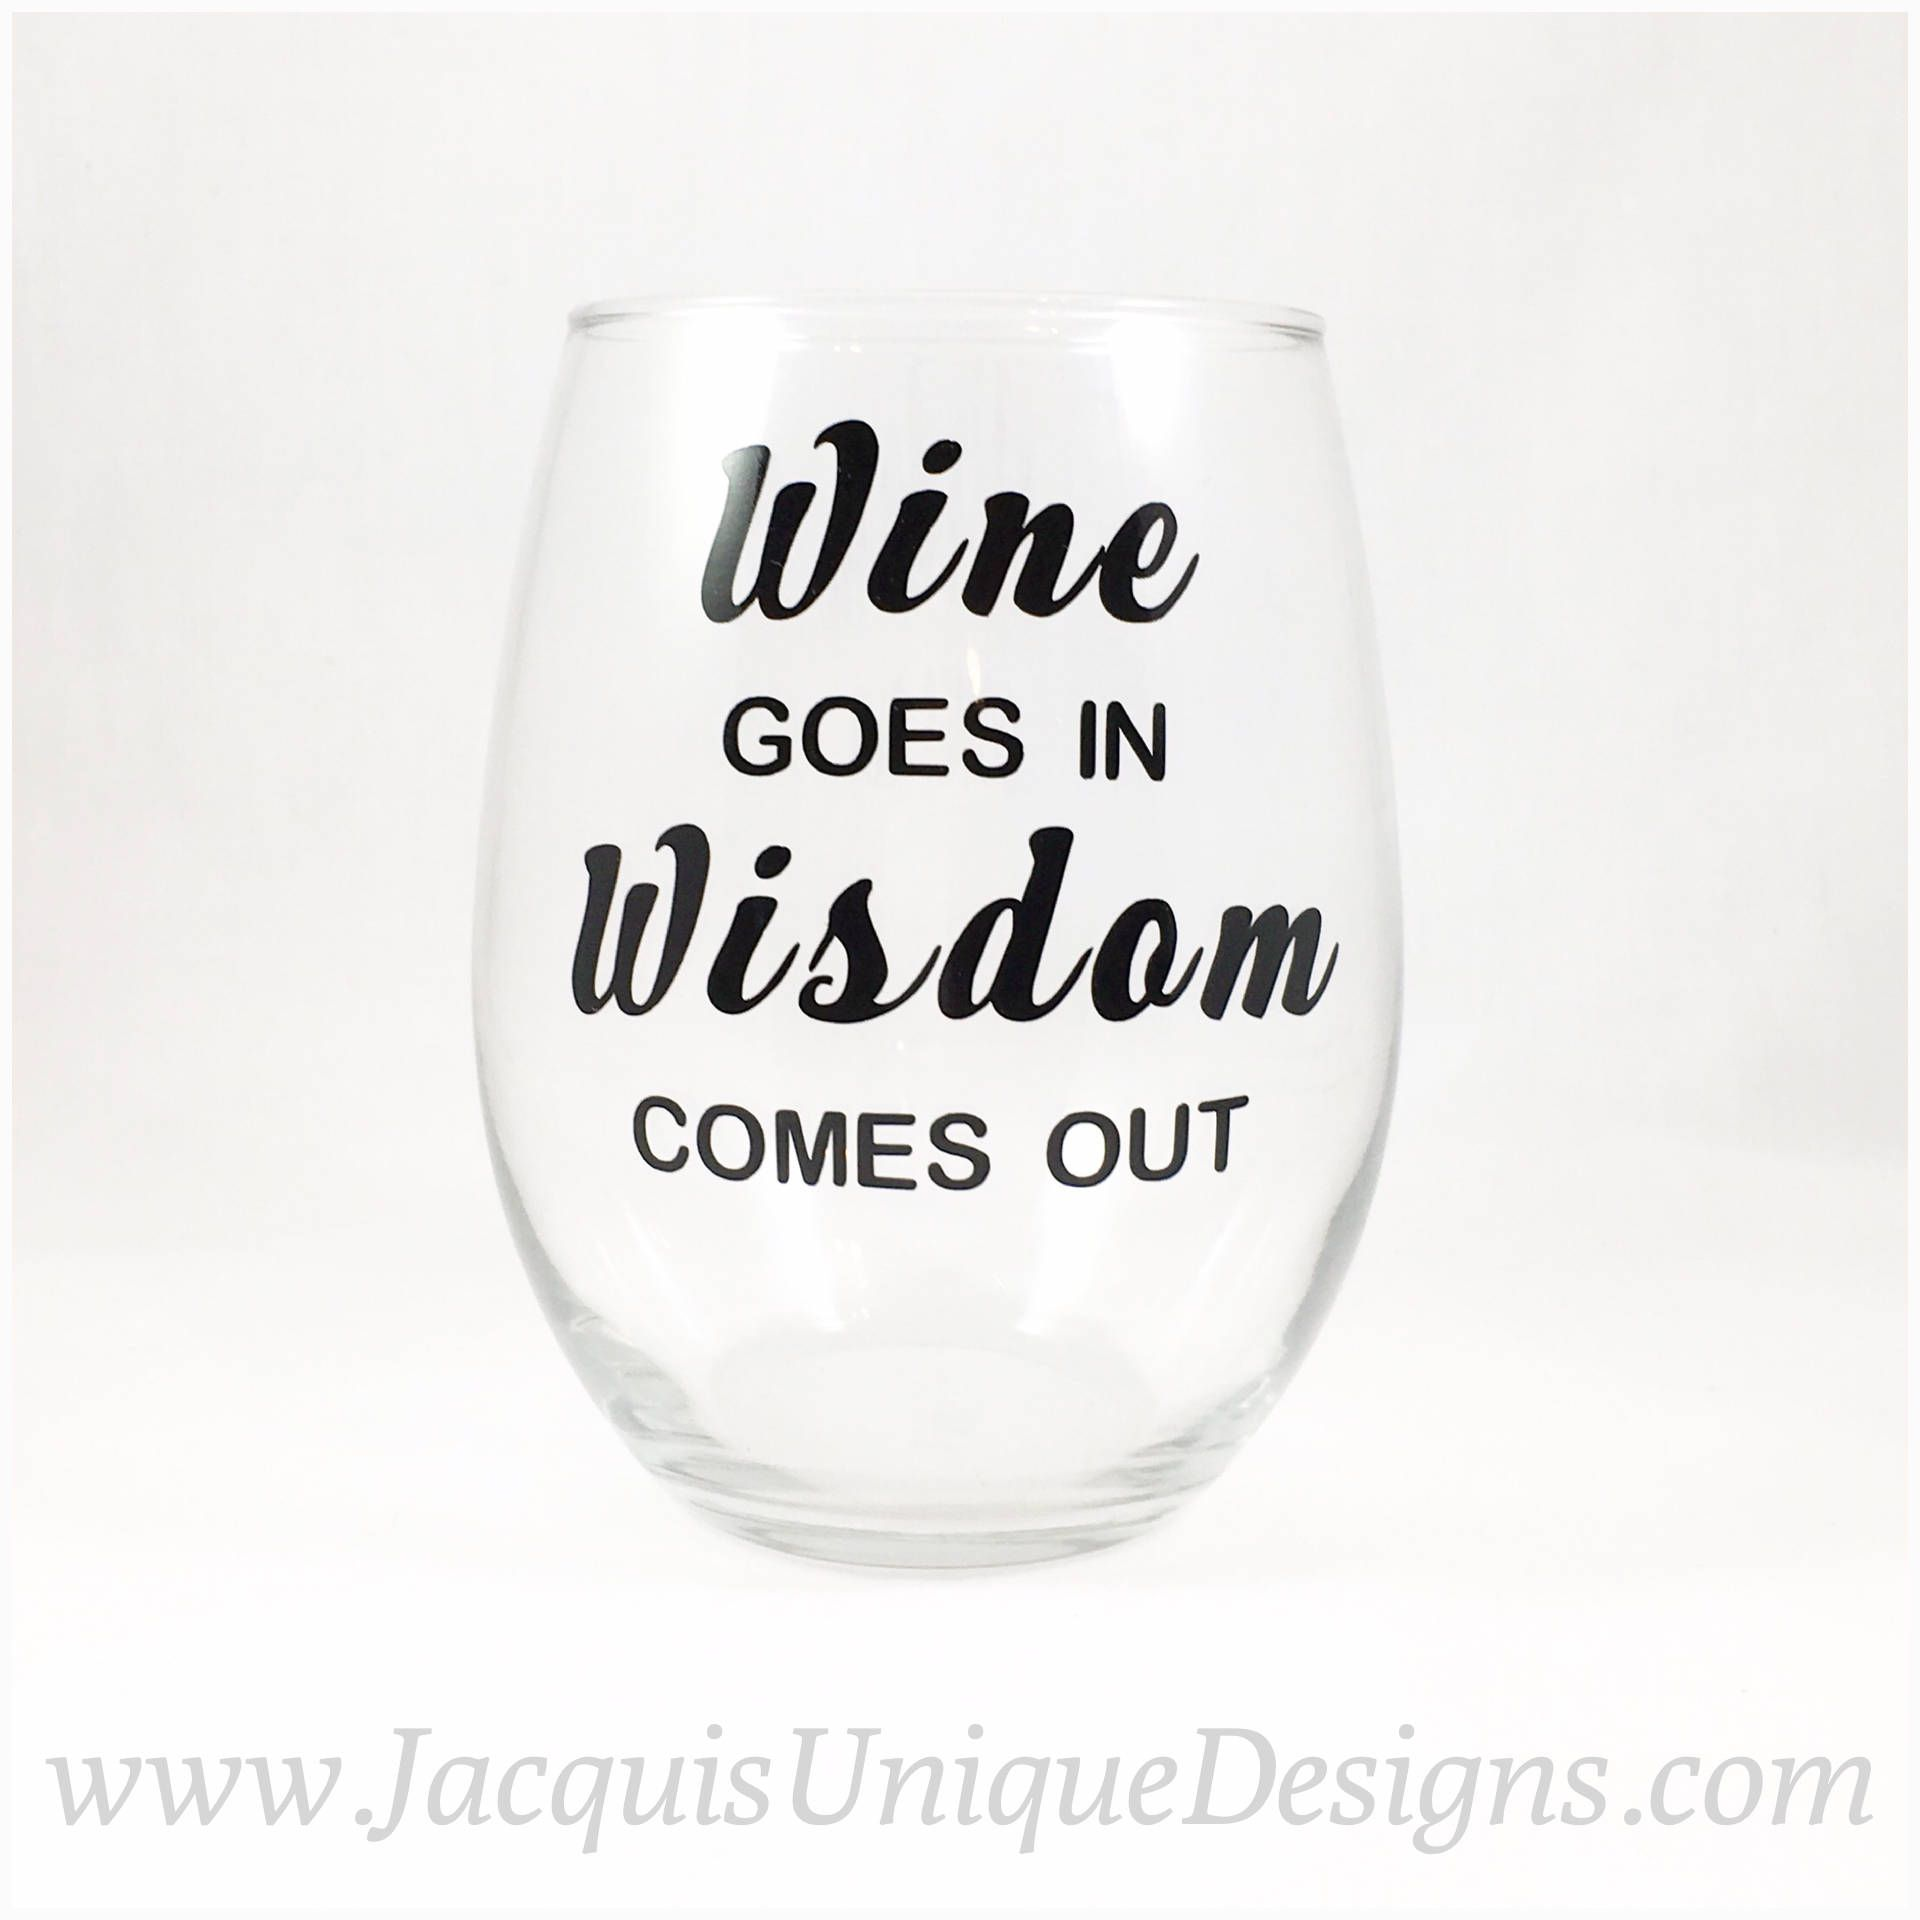 Funny Wine Glass Funny Stemless Wine Glass Wine Quotes Funny Wine Quotes Funny Wedding Gift Wine Love Funny Wine Glass Funny Wine Glasses Funny Wine Gifts